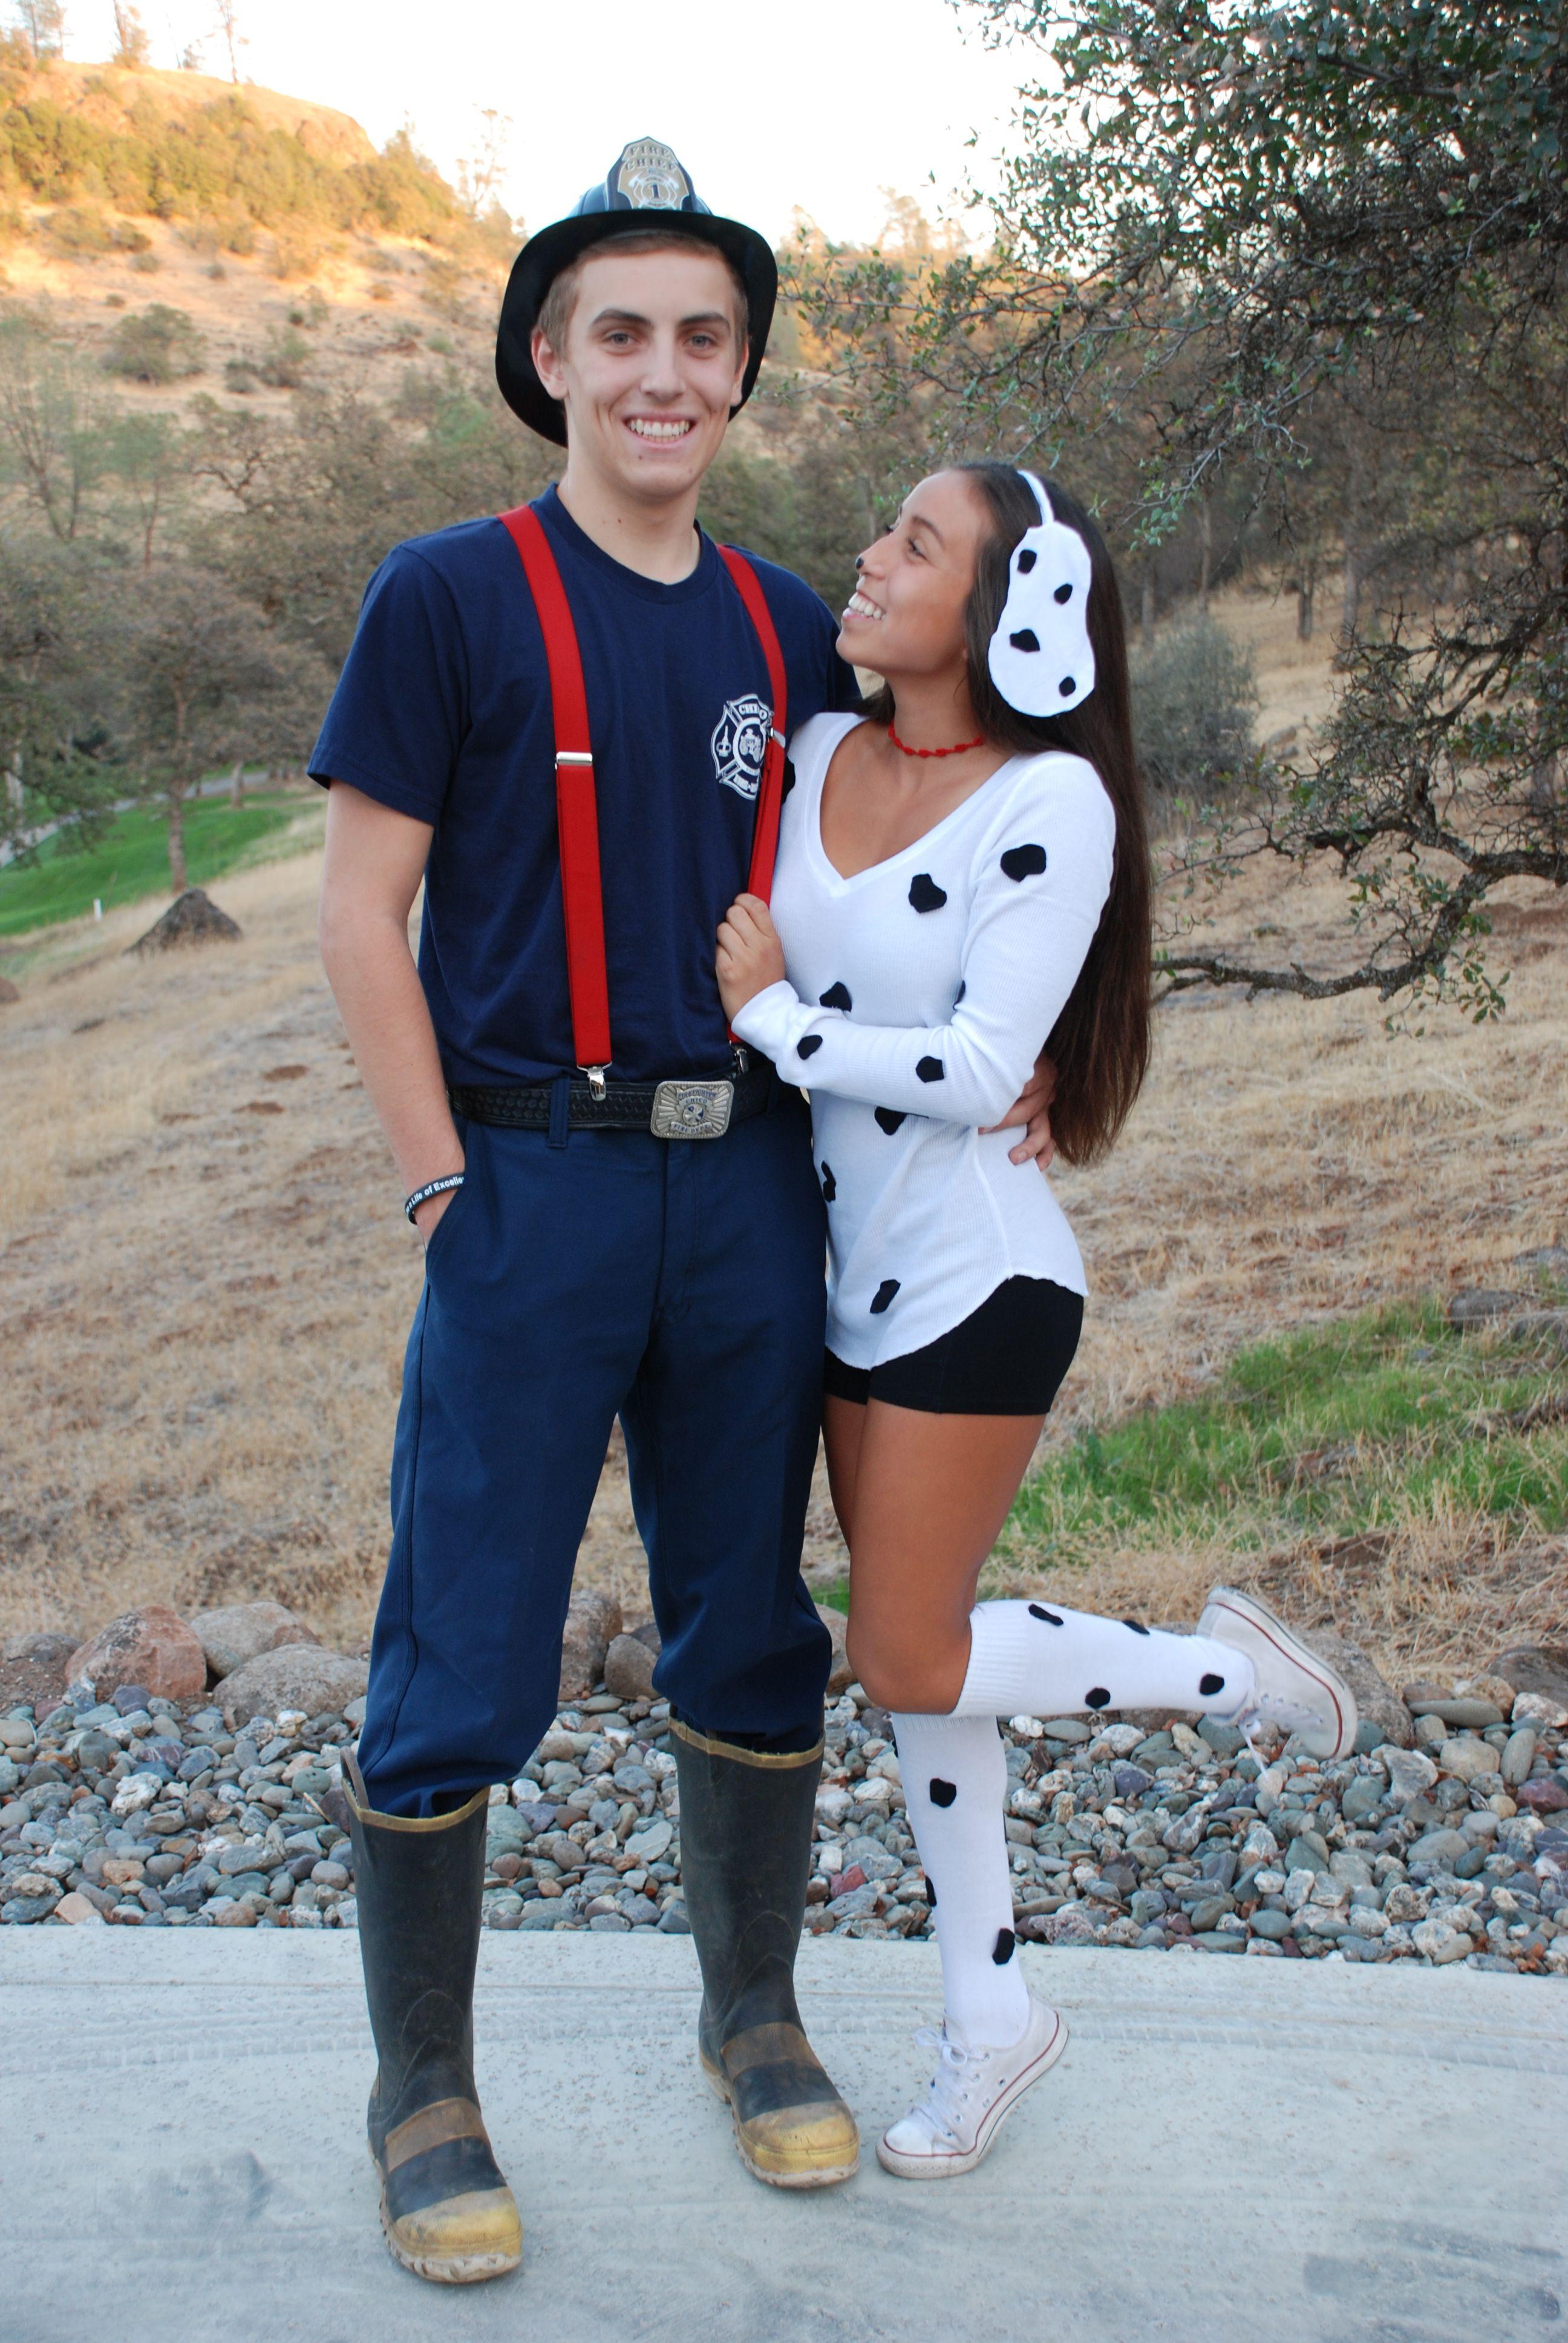 Fireman and Dalmatian costume Halloween More Cute couple